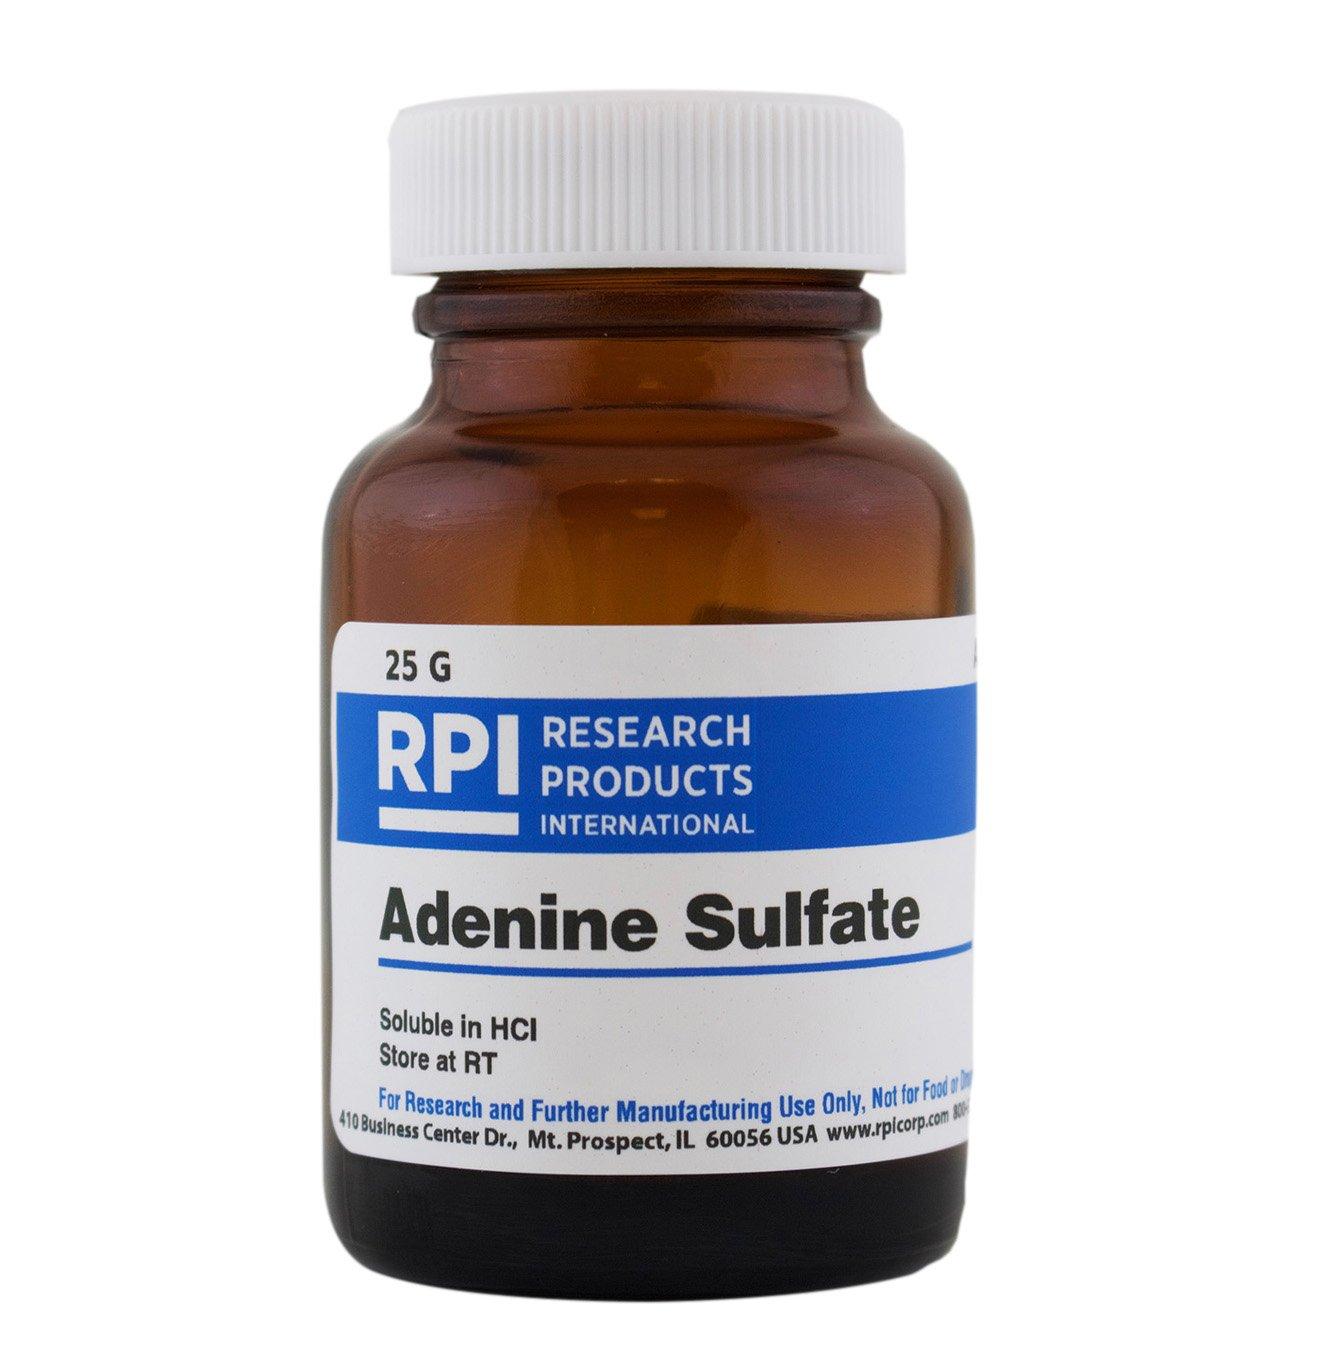 Adenine Sulfate [Adenine Hemisulfate Salt], 25 Grams by RPI (Image #1)